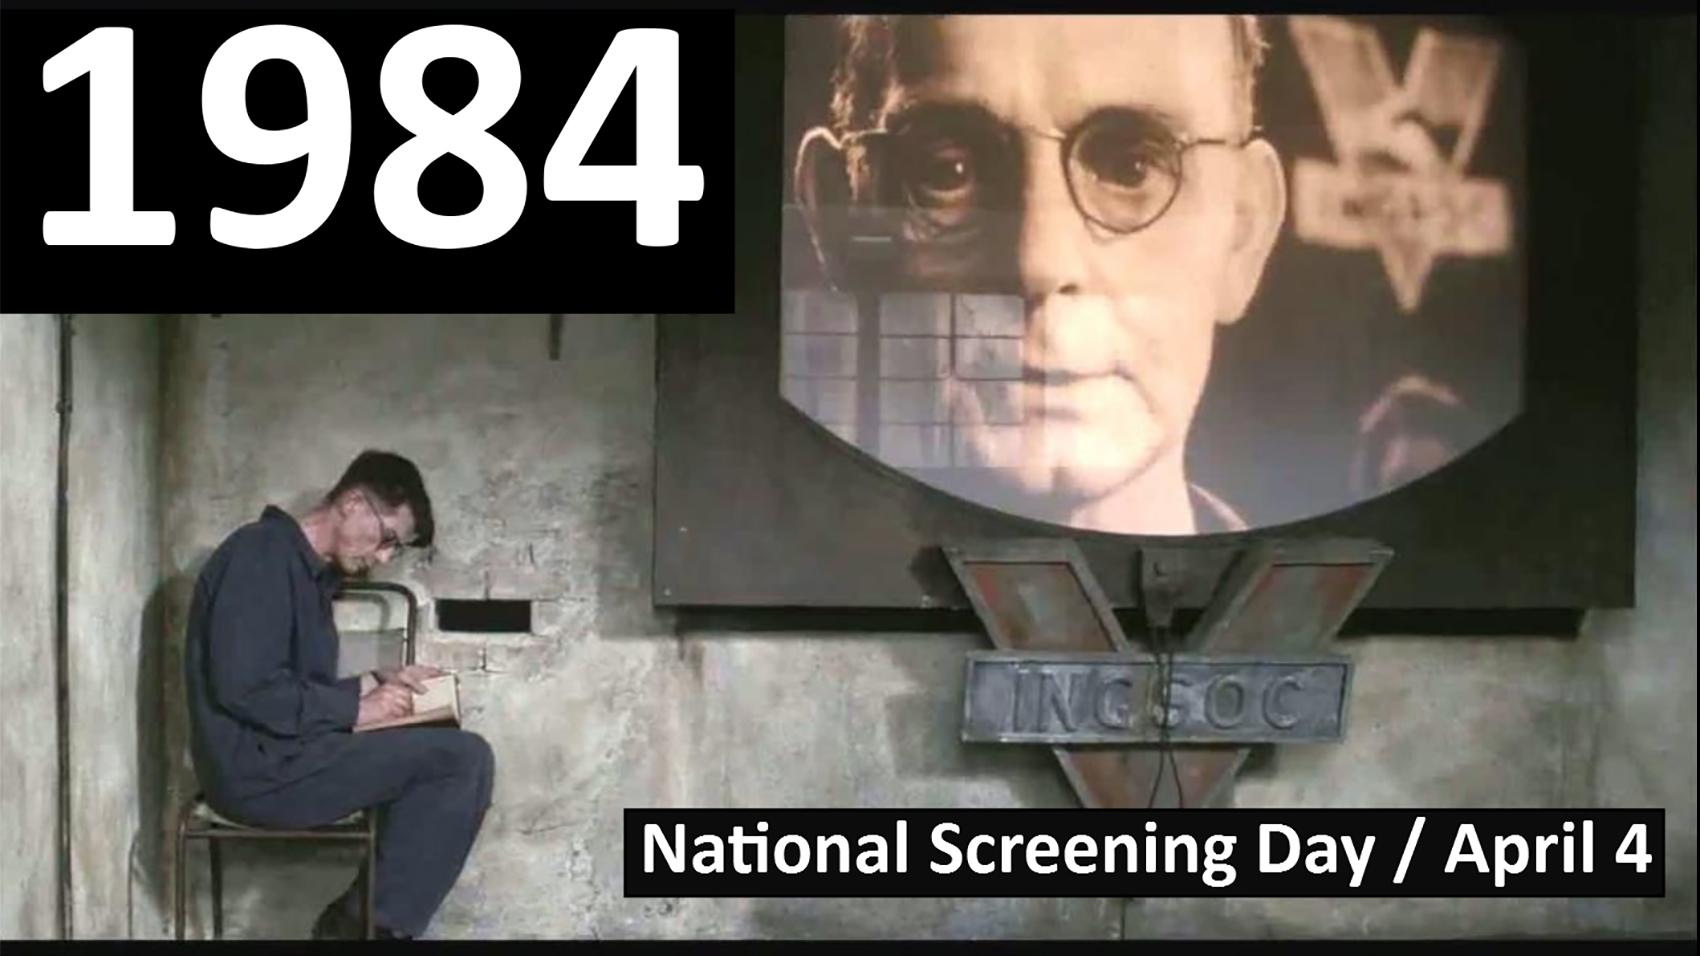 1984 movie screening day